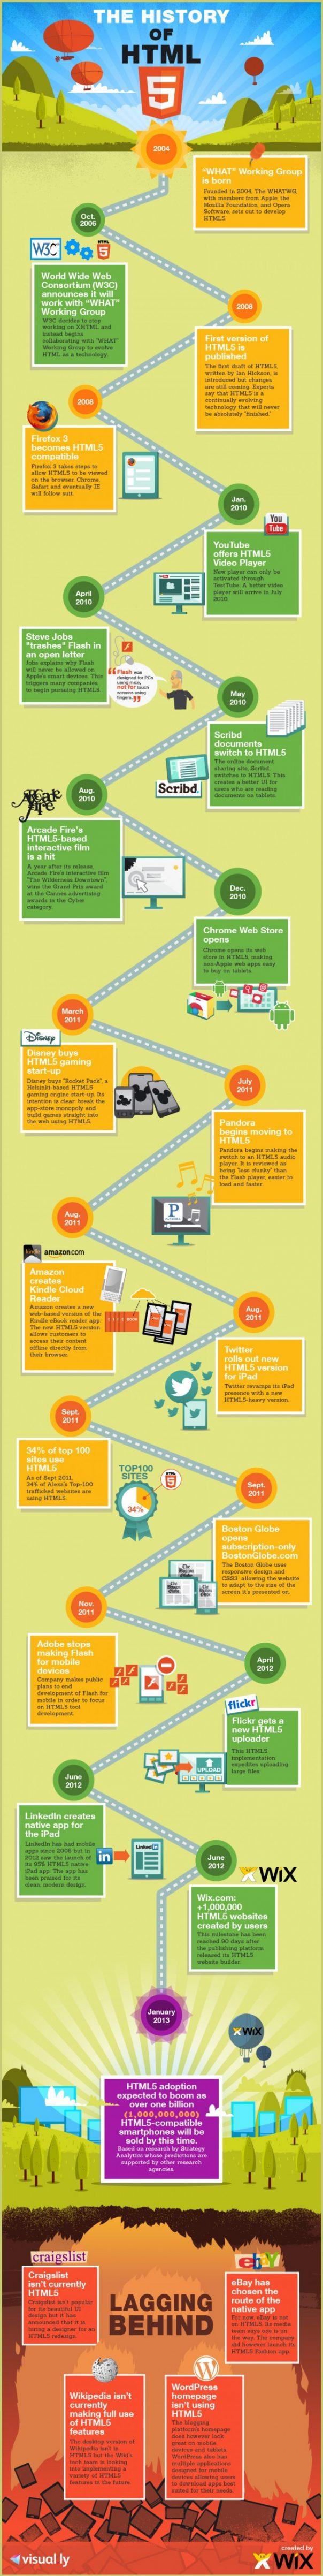 Histoire de l'HTML5